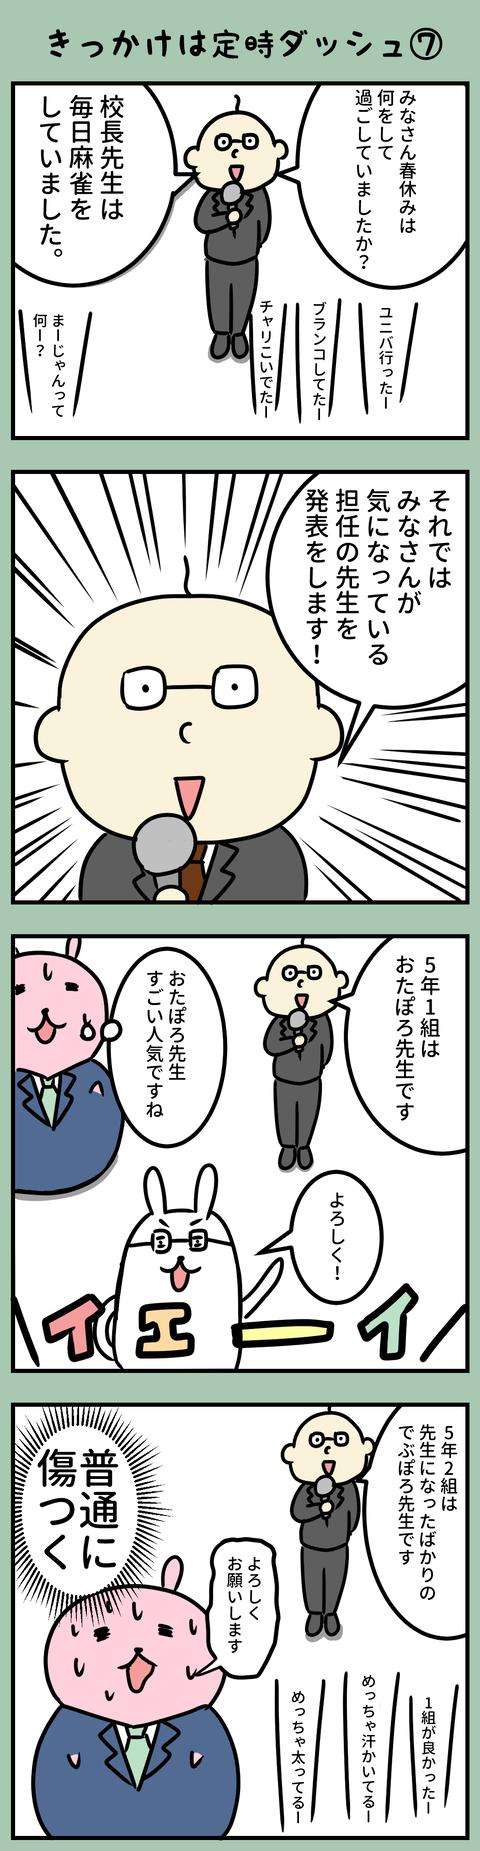 manga-yuzuporo54-1